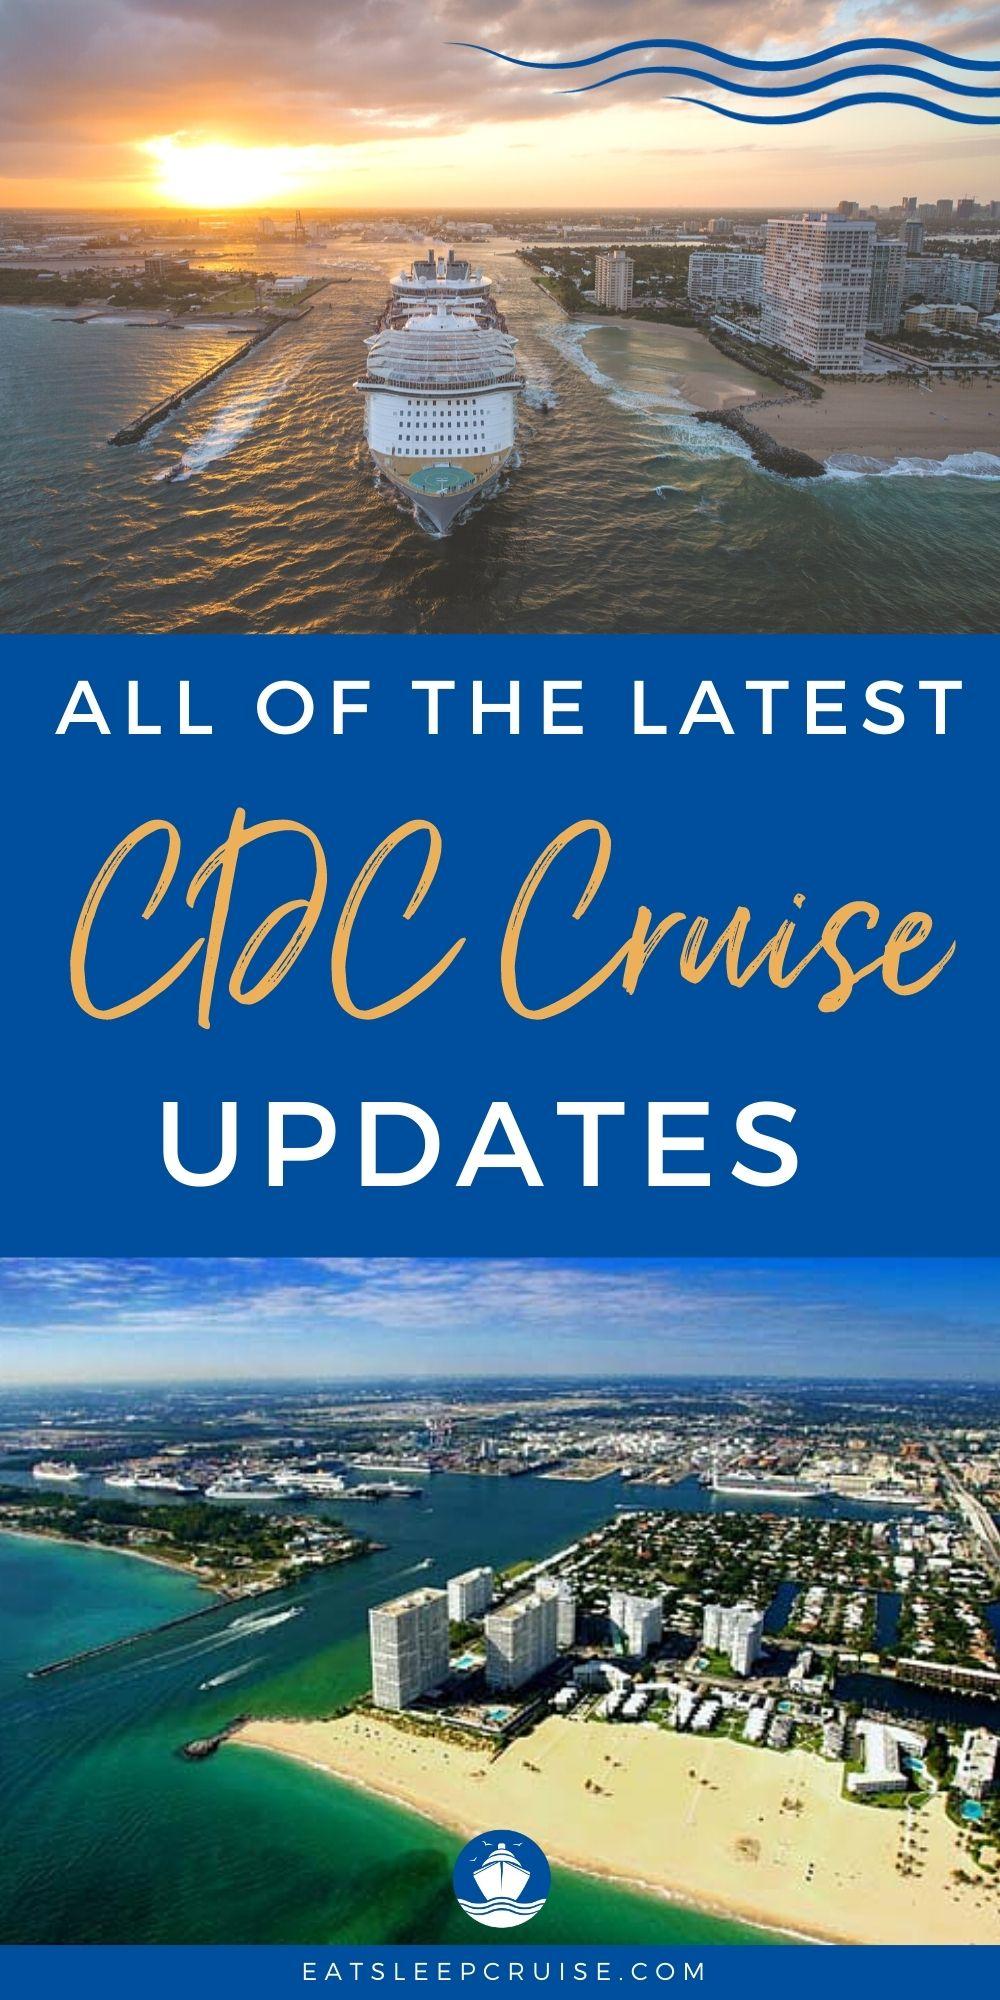 Latest CDC Cruise Updates